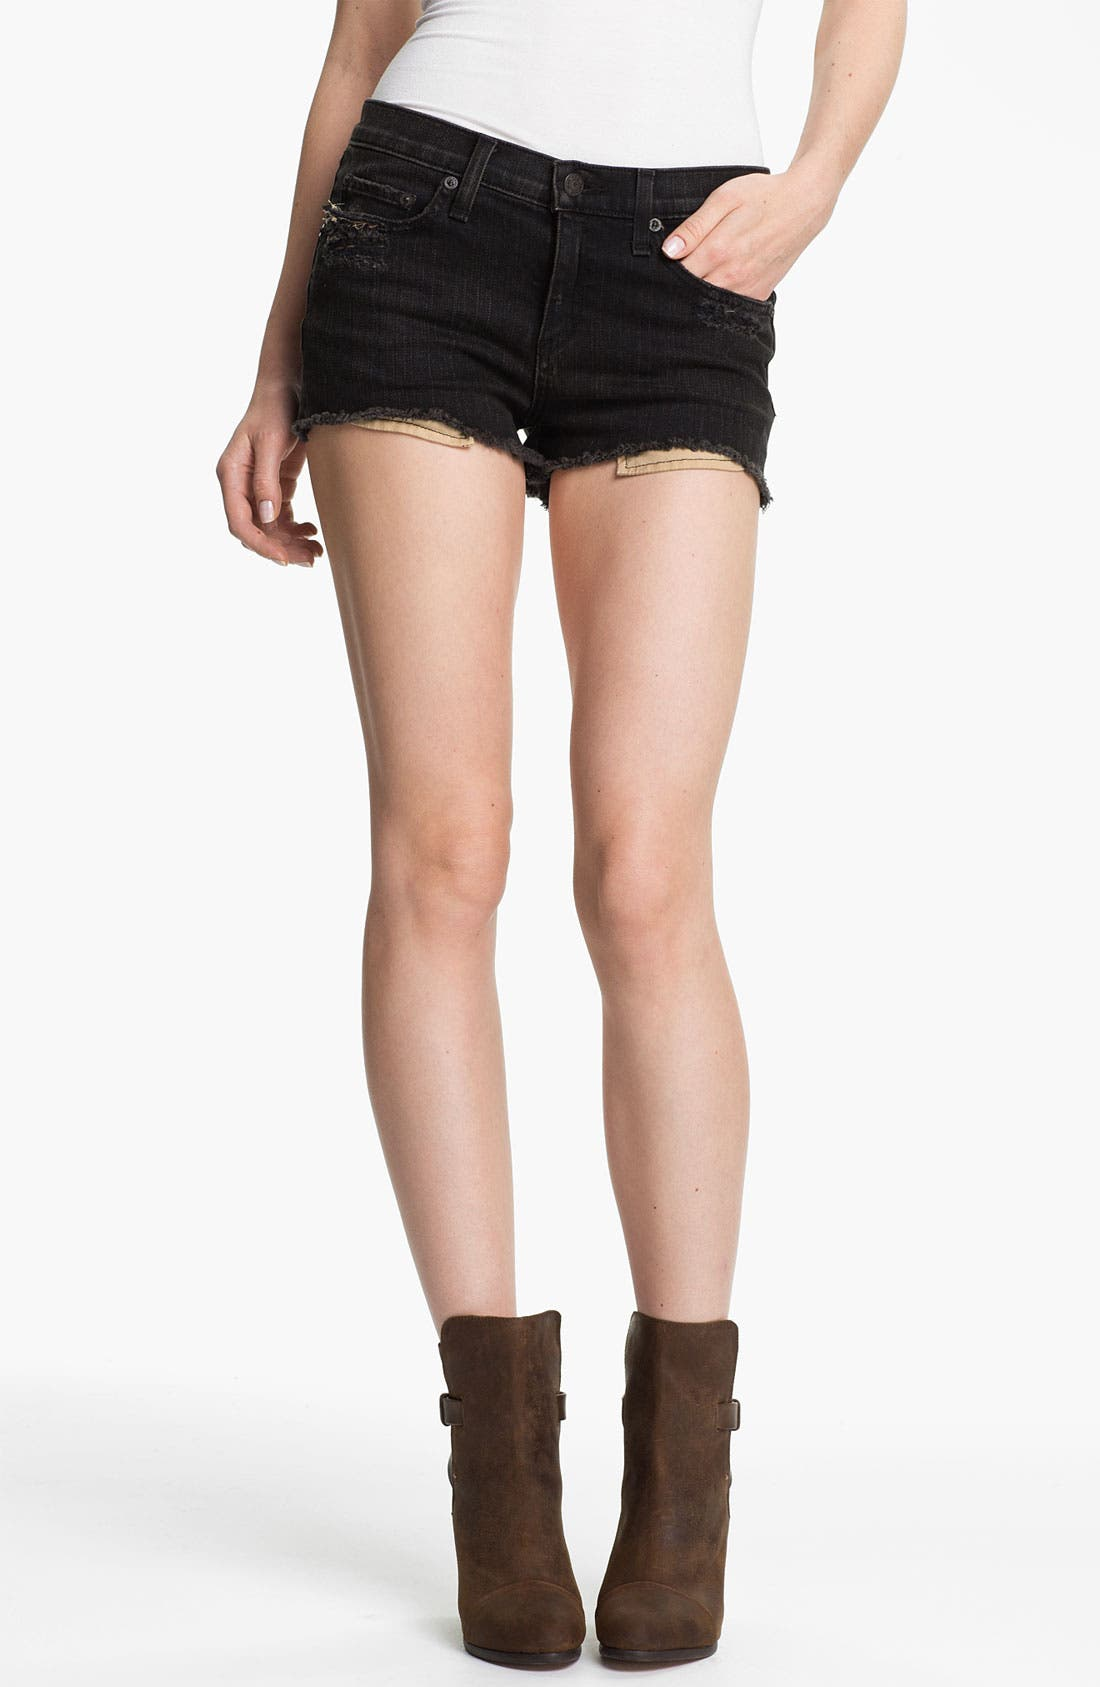 Alternate Image 1 Selected - rag & bone 'Mila' Cutoff Denim Shorts